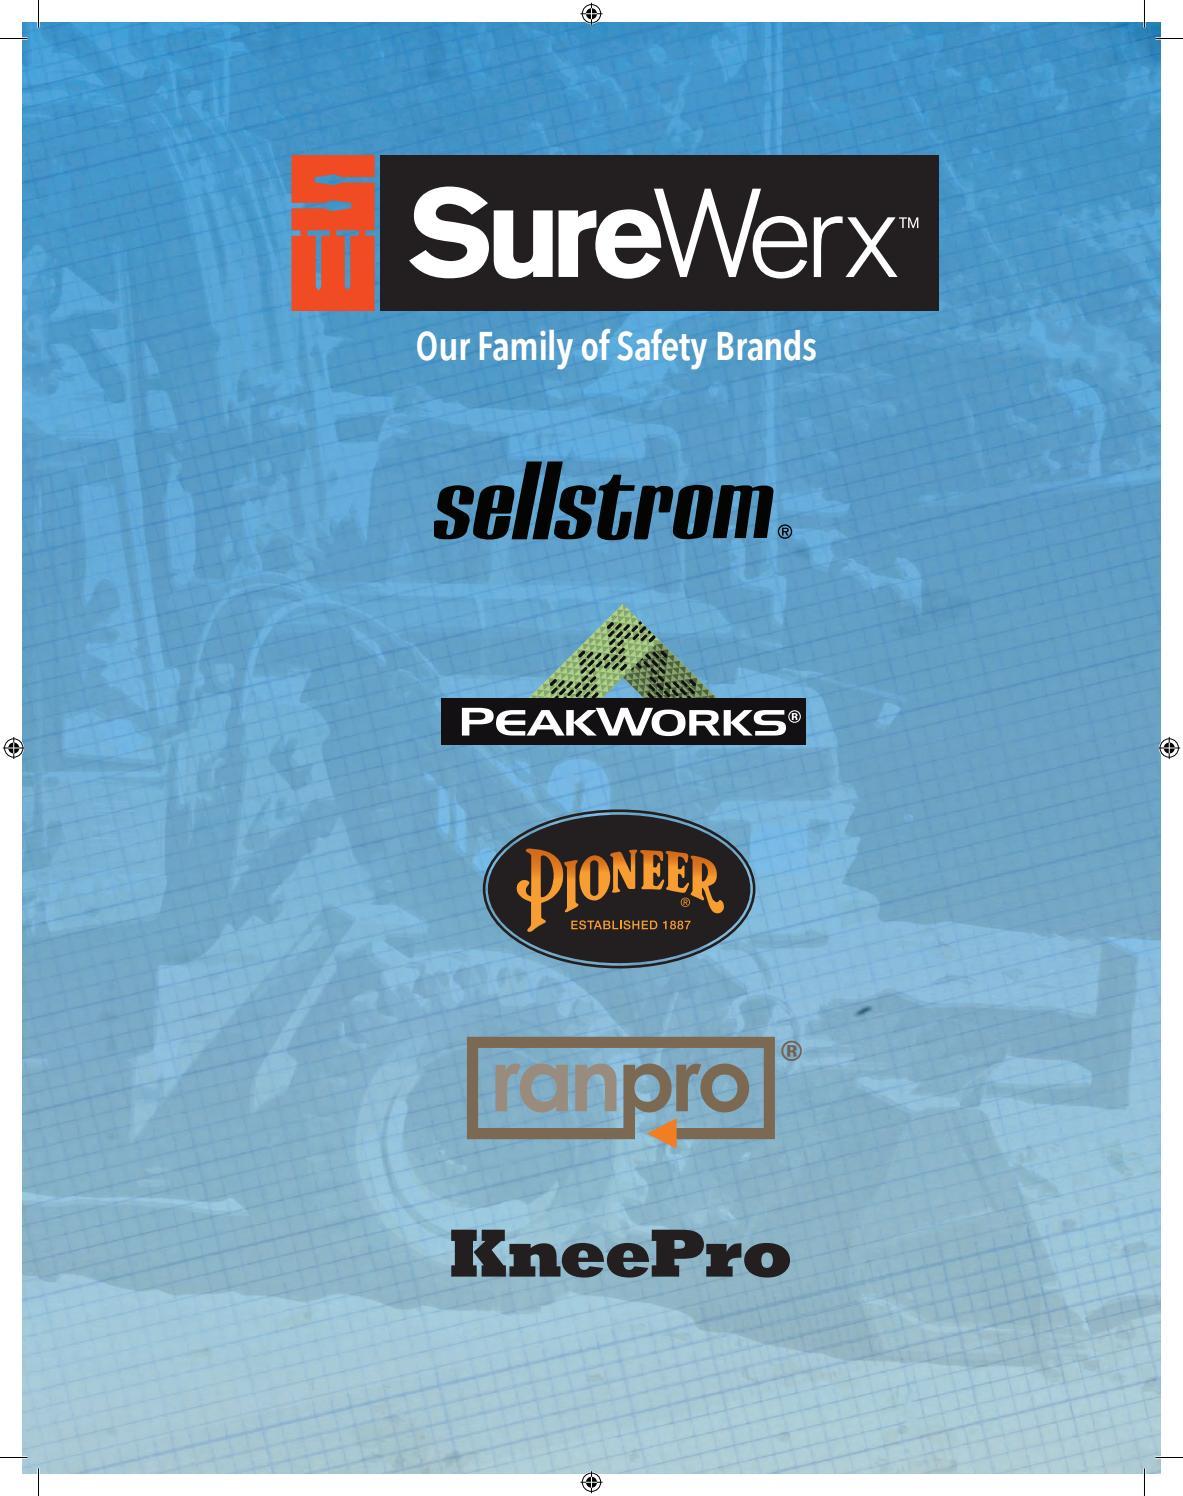 Surewerx Catalog By James Swanson Issuu